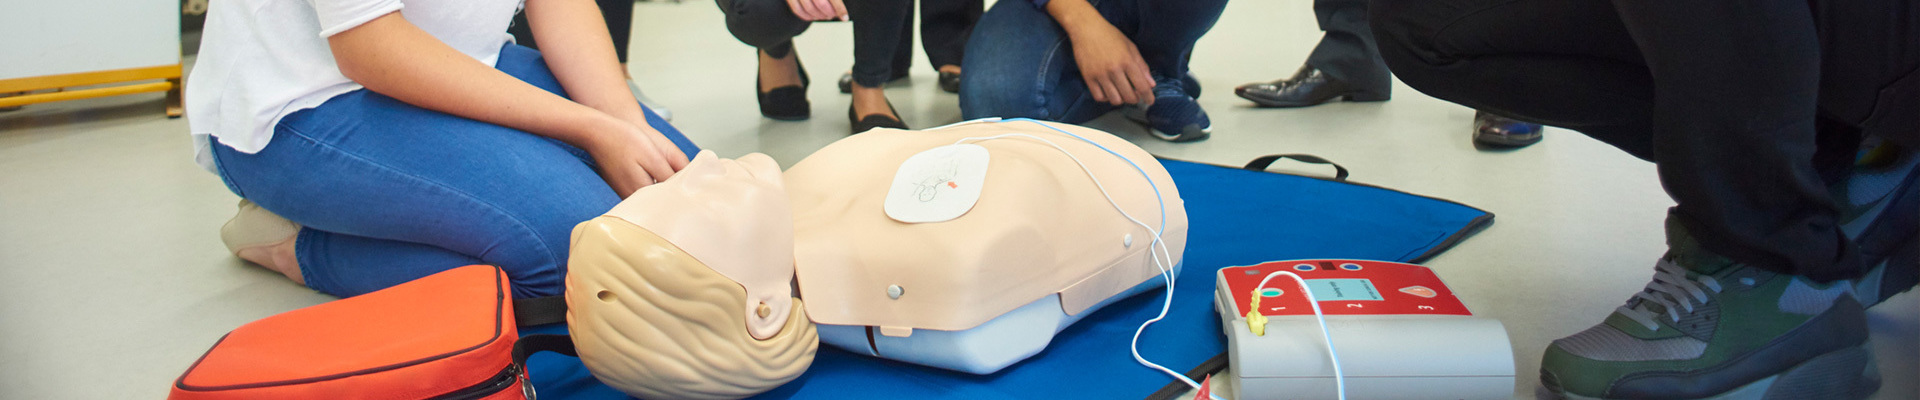 First aid Training Provider in Pontypridd, Health and Social Care Training in Pontypridd, Training Company Pontypridd